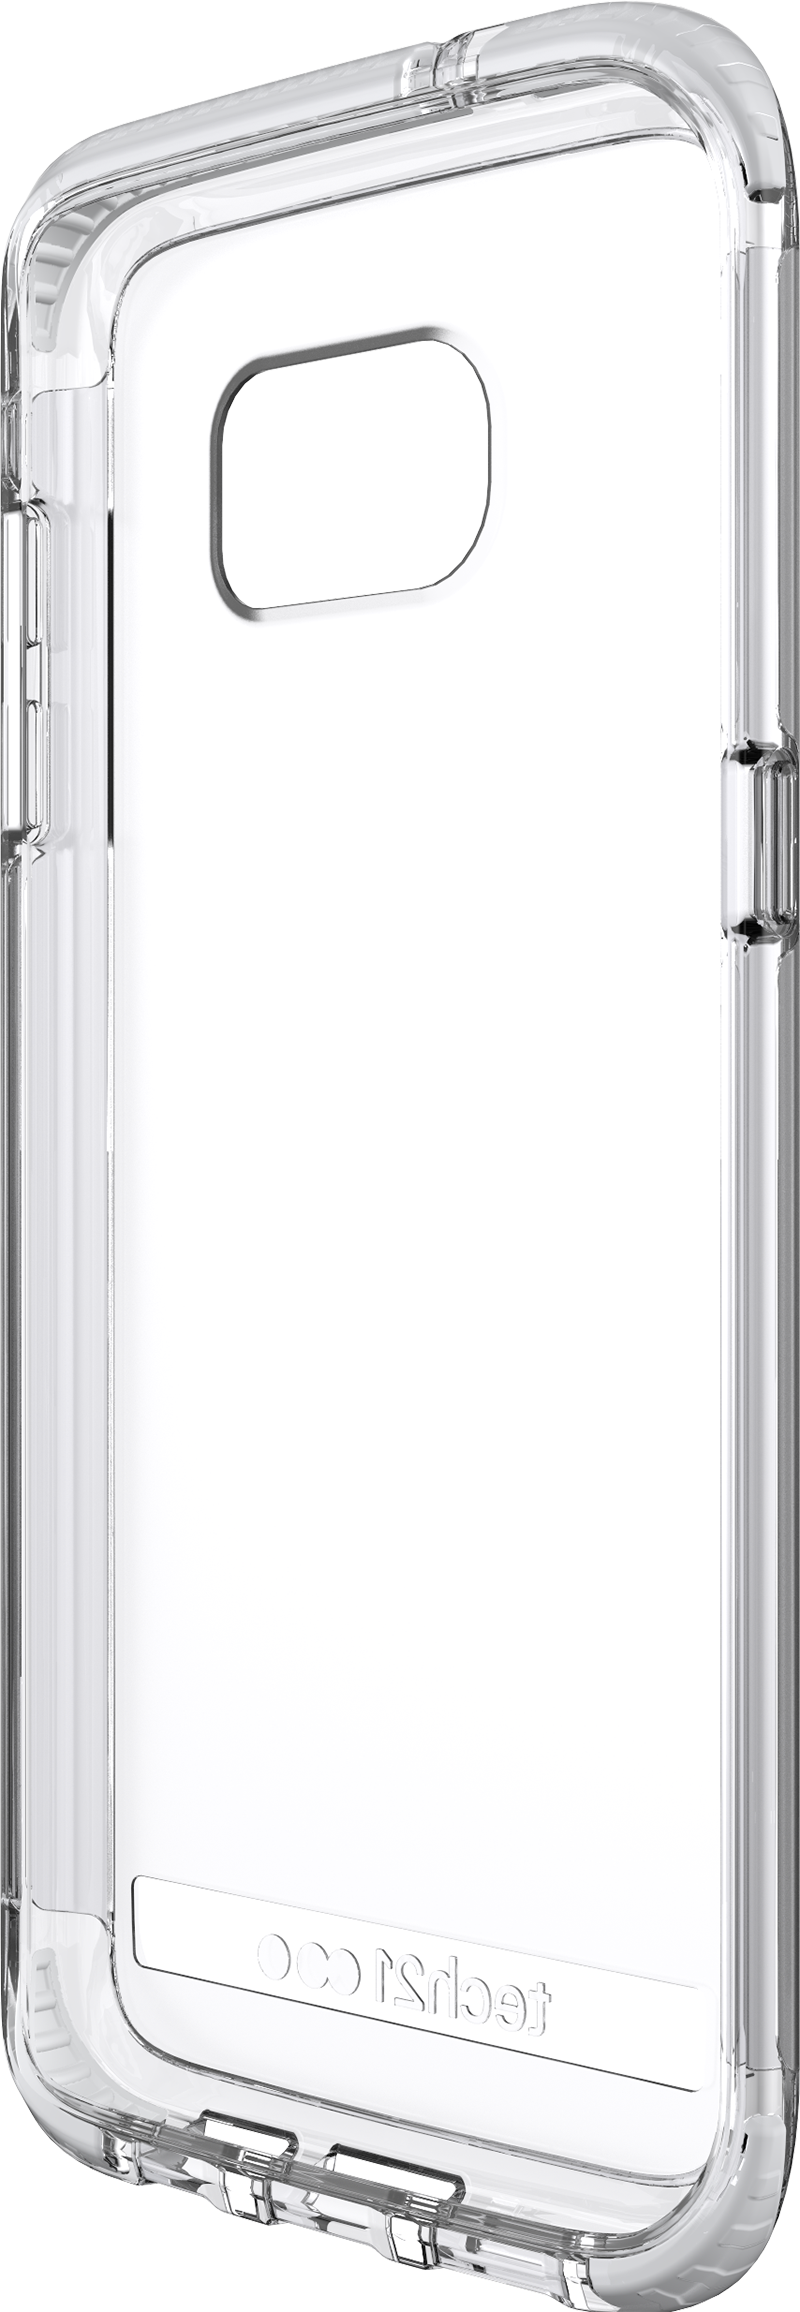 Coque Evo Frame Tech21 Galaxy S7 edge